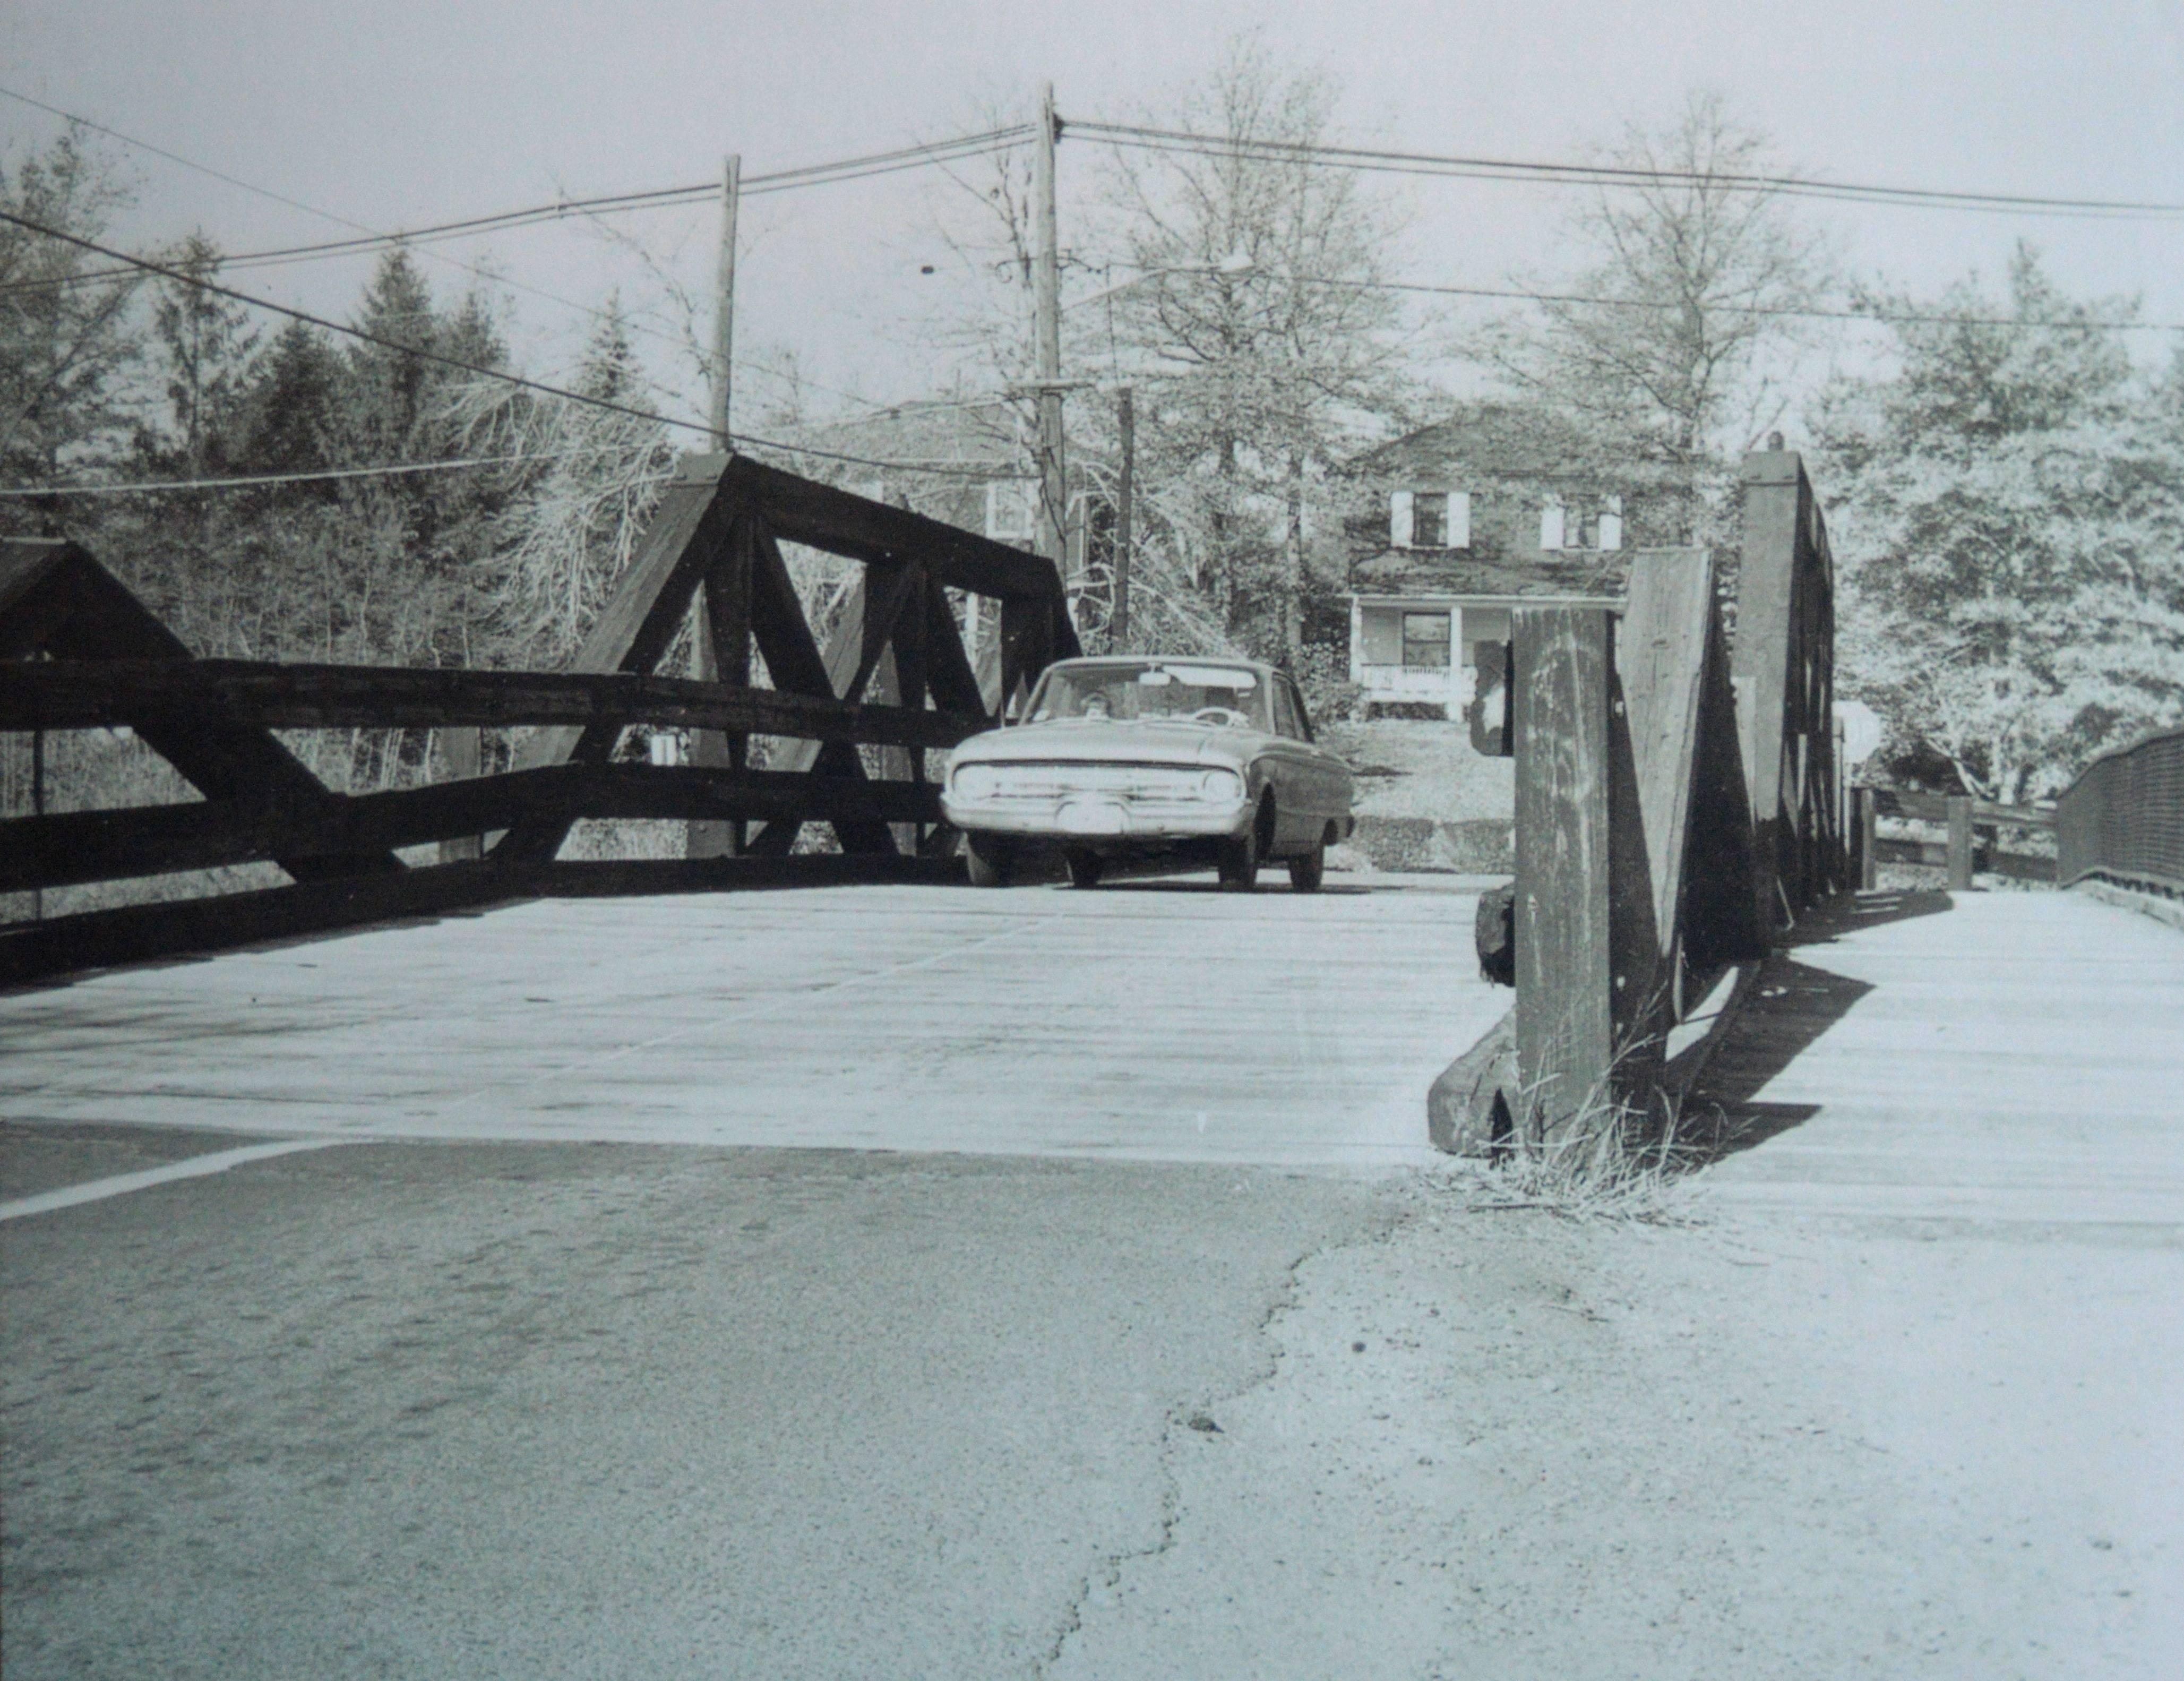 05135f49df668520204f_Sheelen_s_Crossing_bridg_1950s.JPG